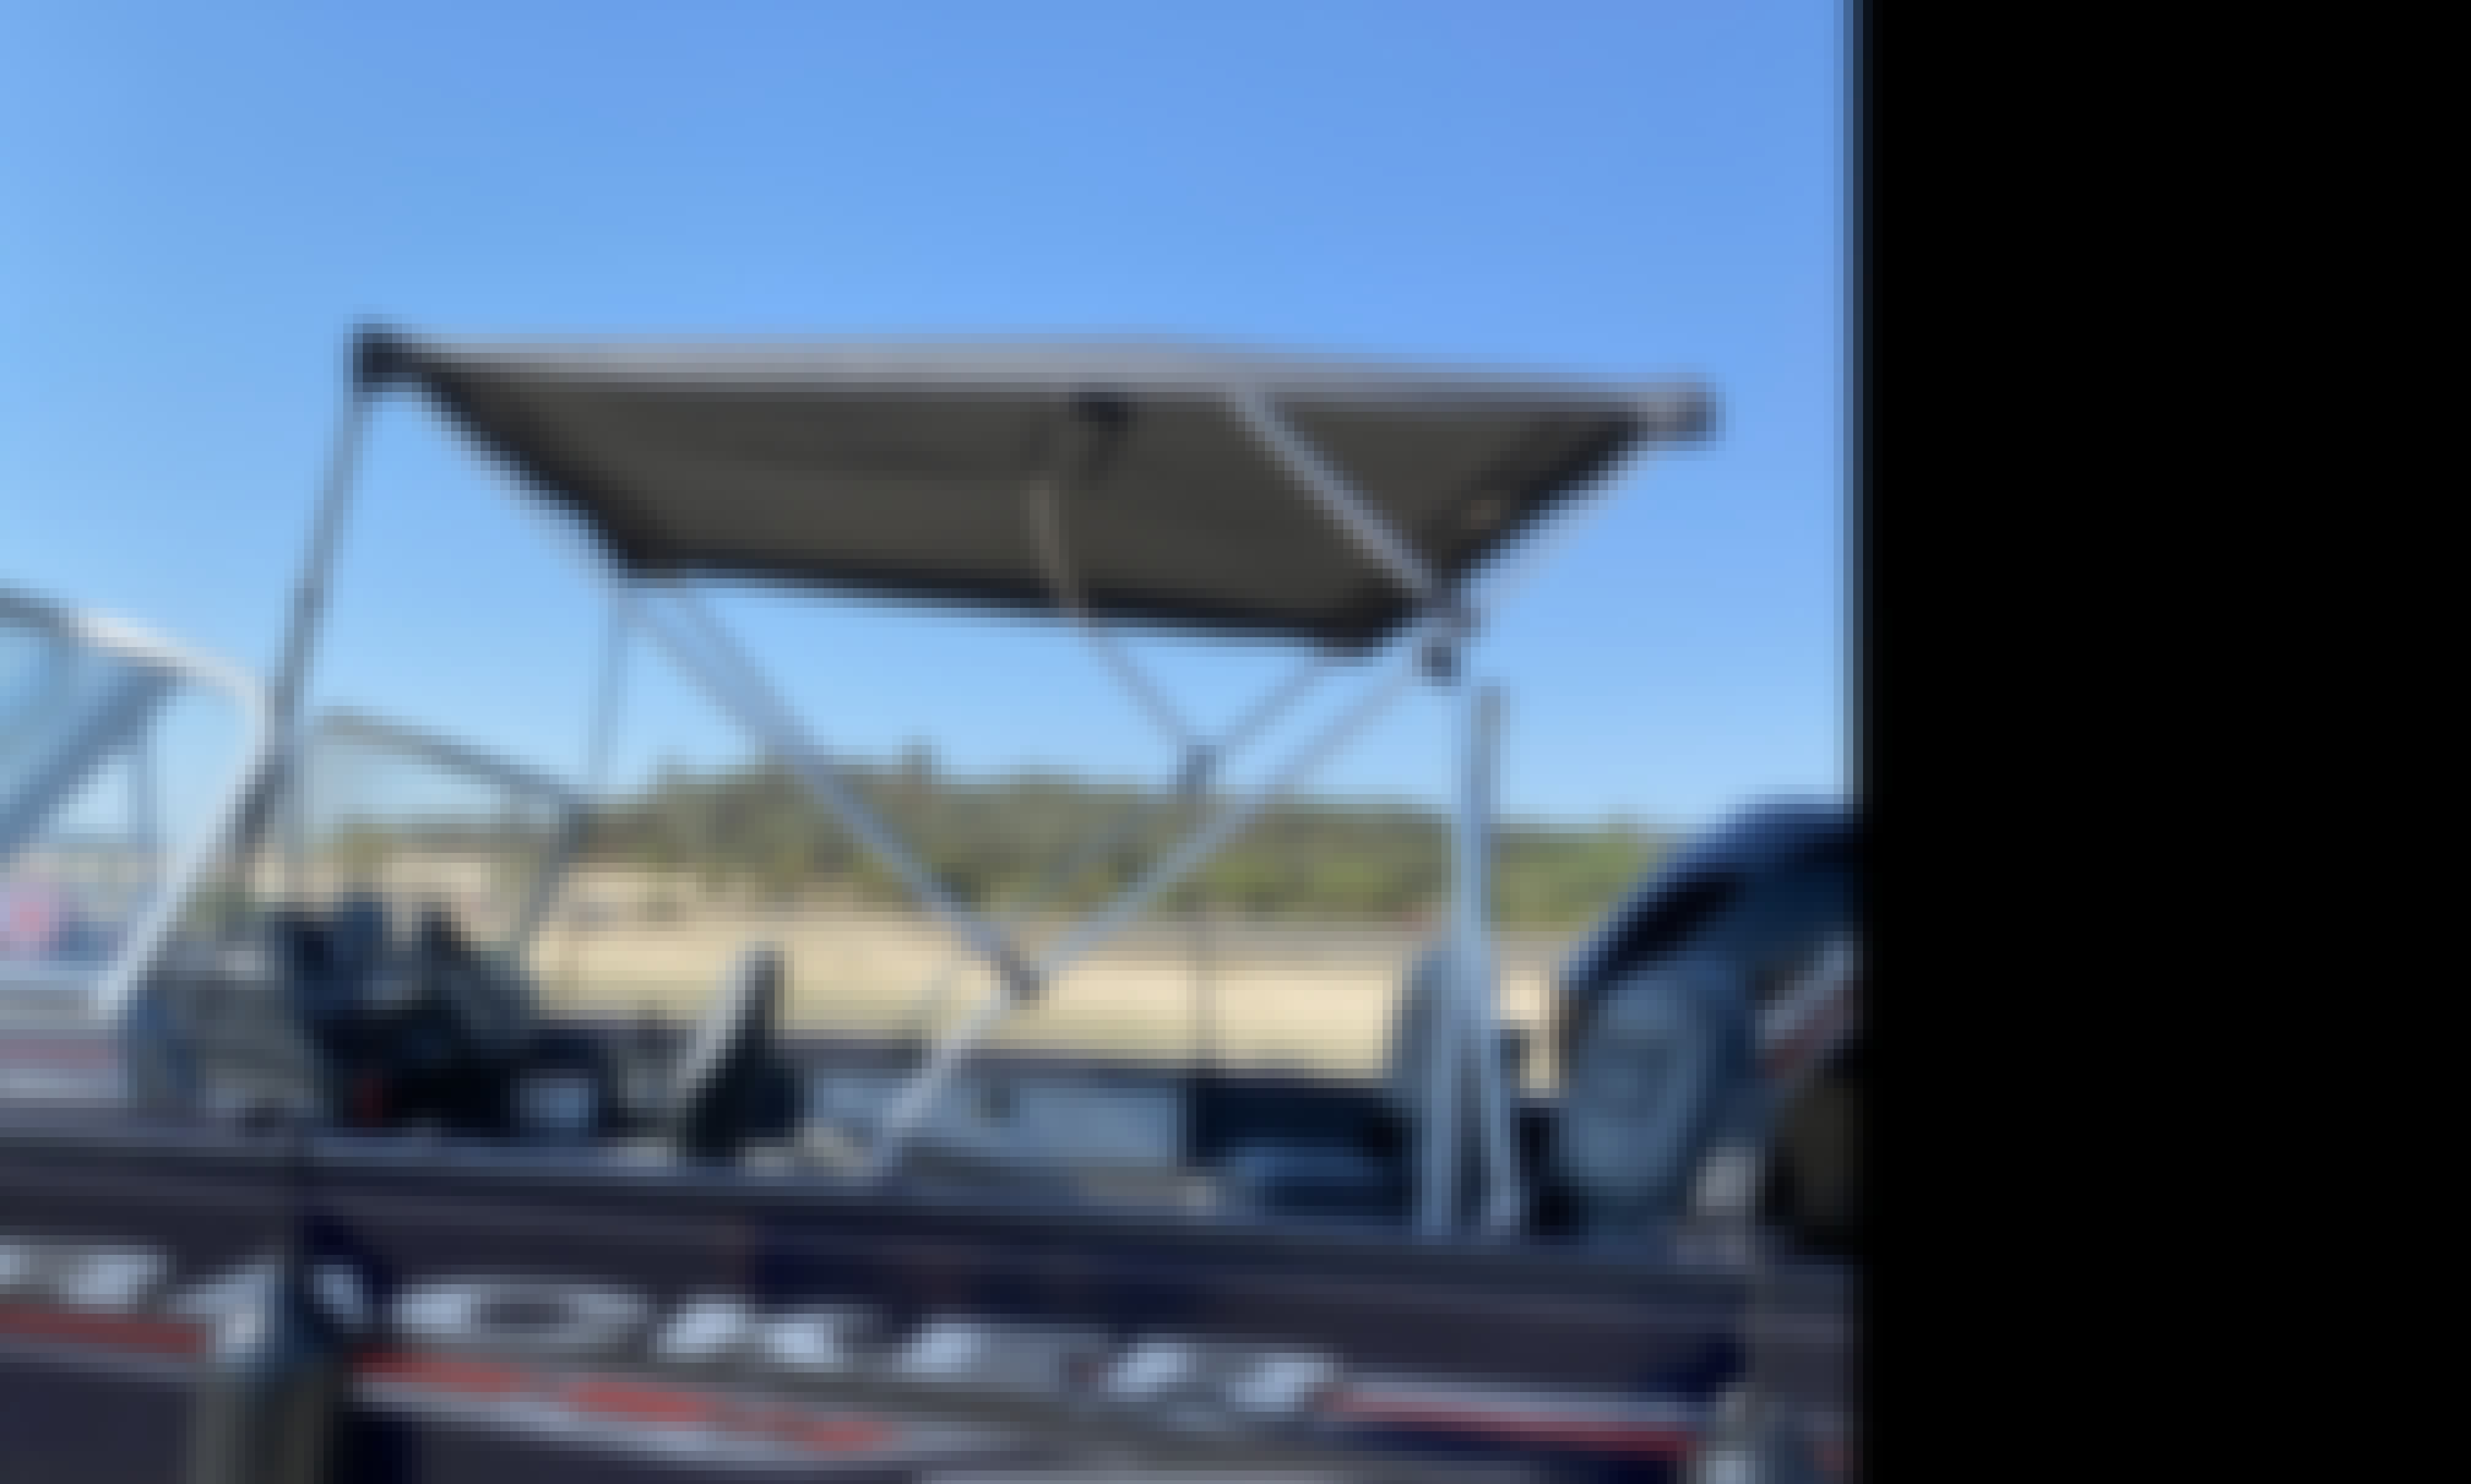 Brandnew Tracker V175 Combo Boat for Rent in Folsom lake